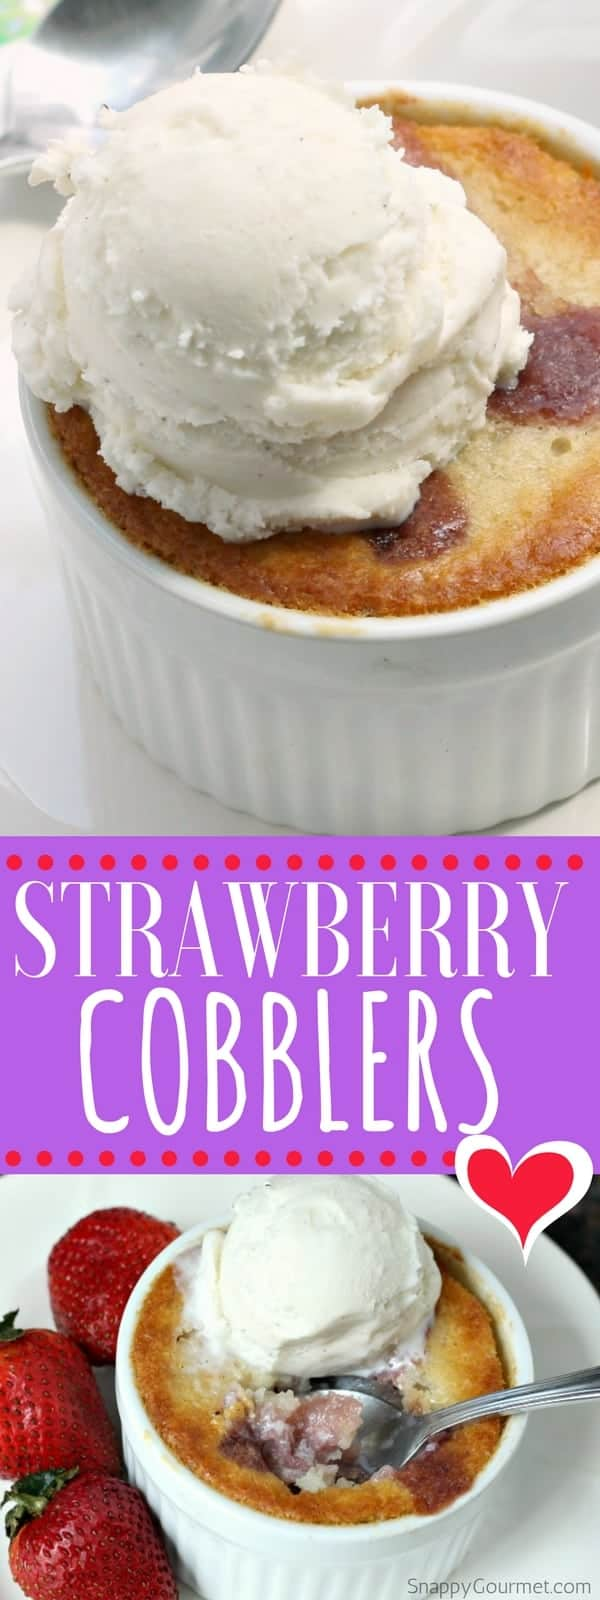 Strawberry Cobbler Recipe - individual easy strawberry cobblers with fresh strawberries baked in ramekins. Simple dessert idea!